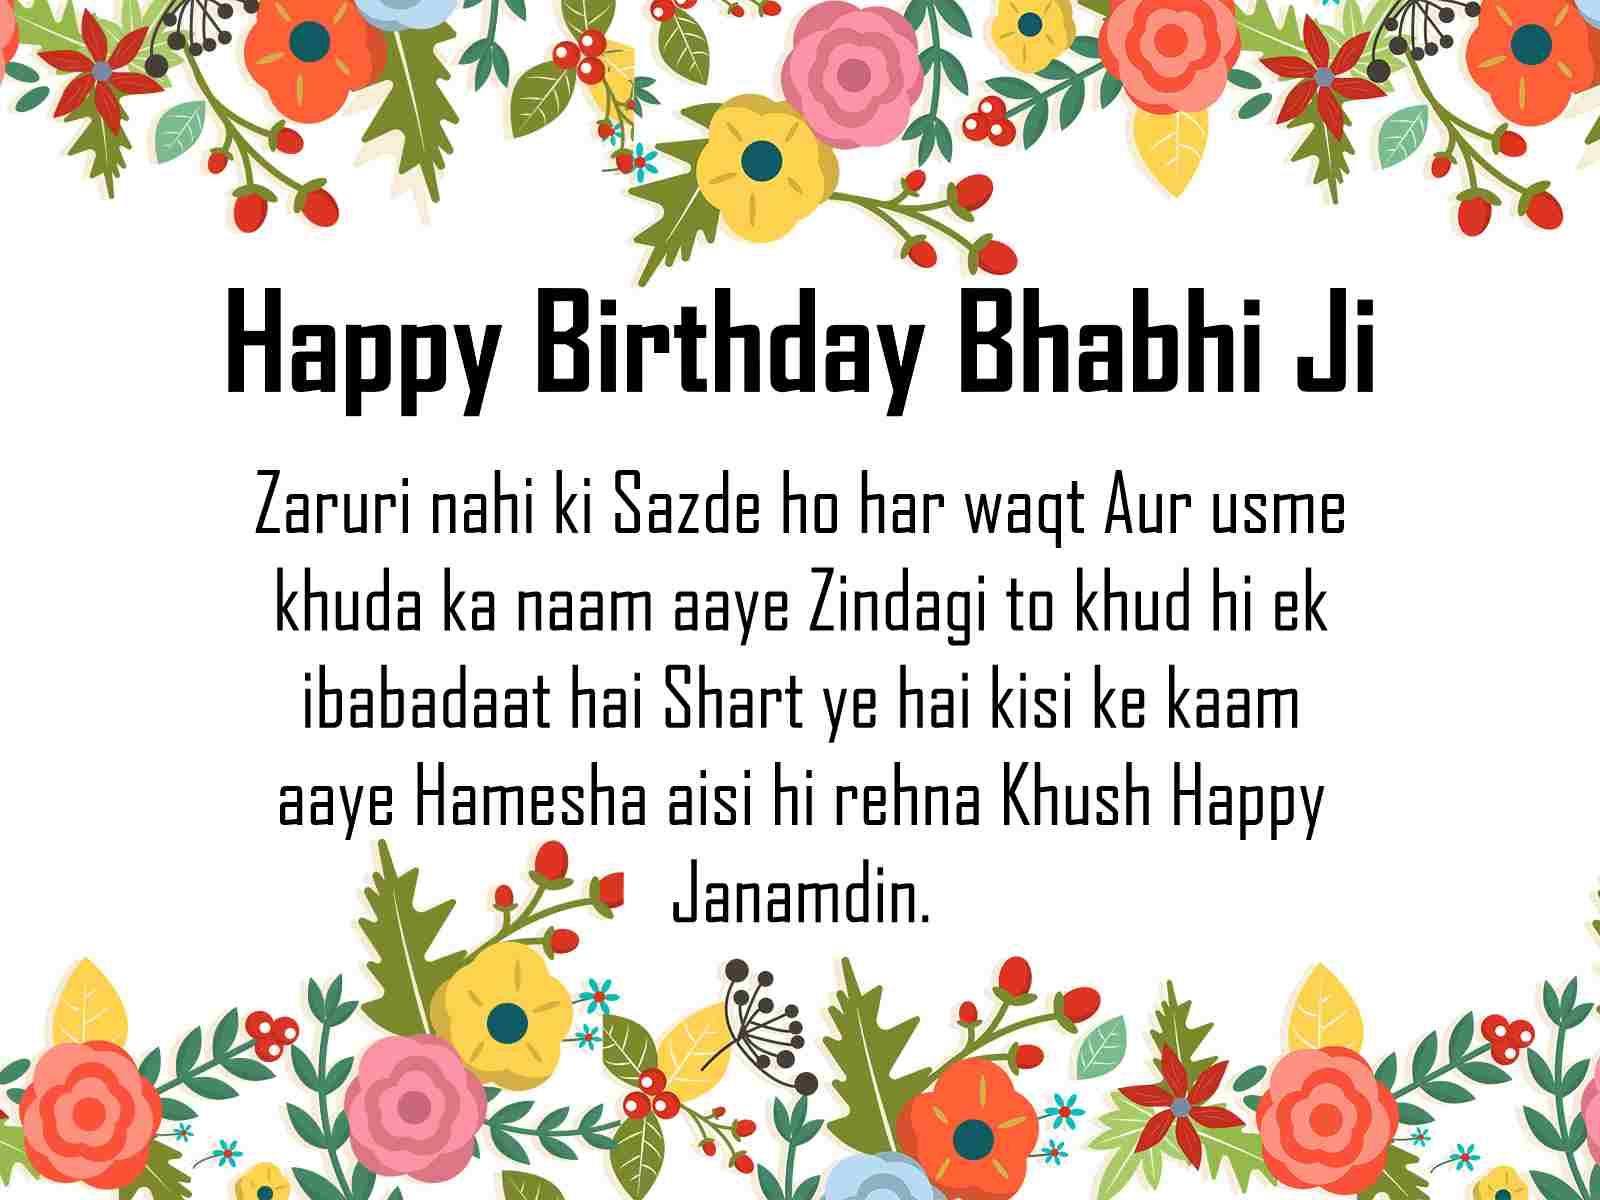 Birthday Wishes For Bhabhi Pinterest thumbnail